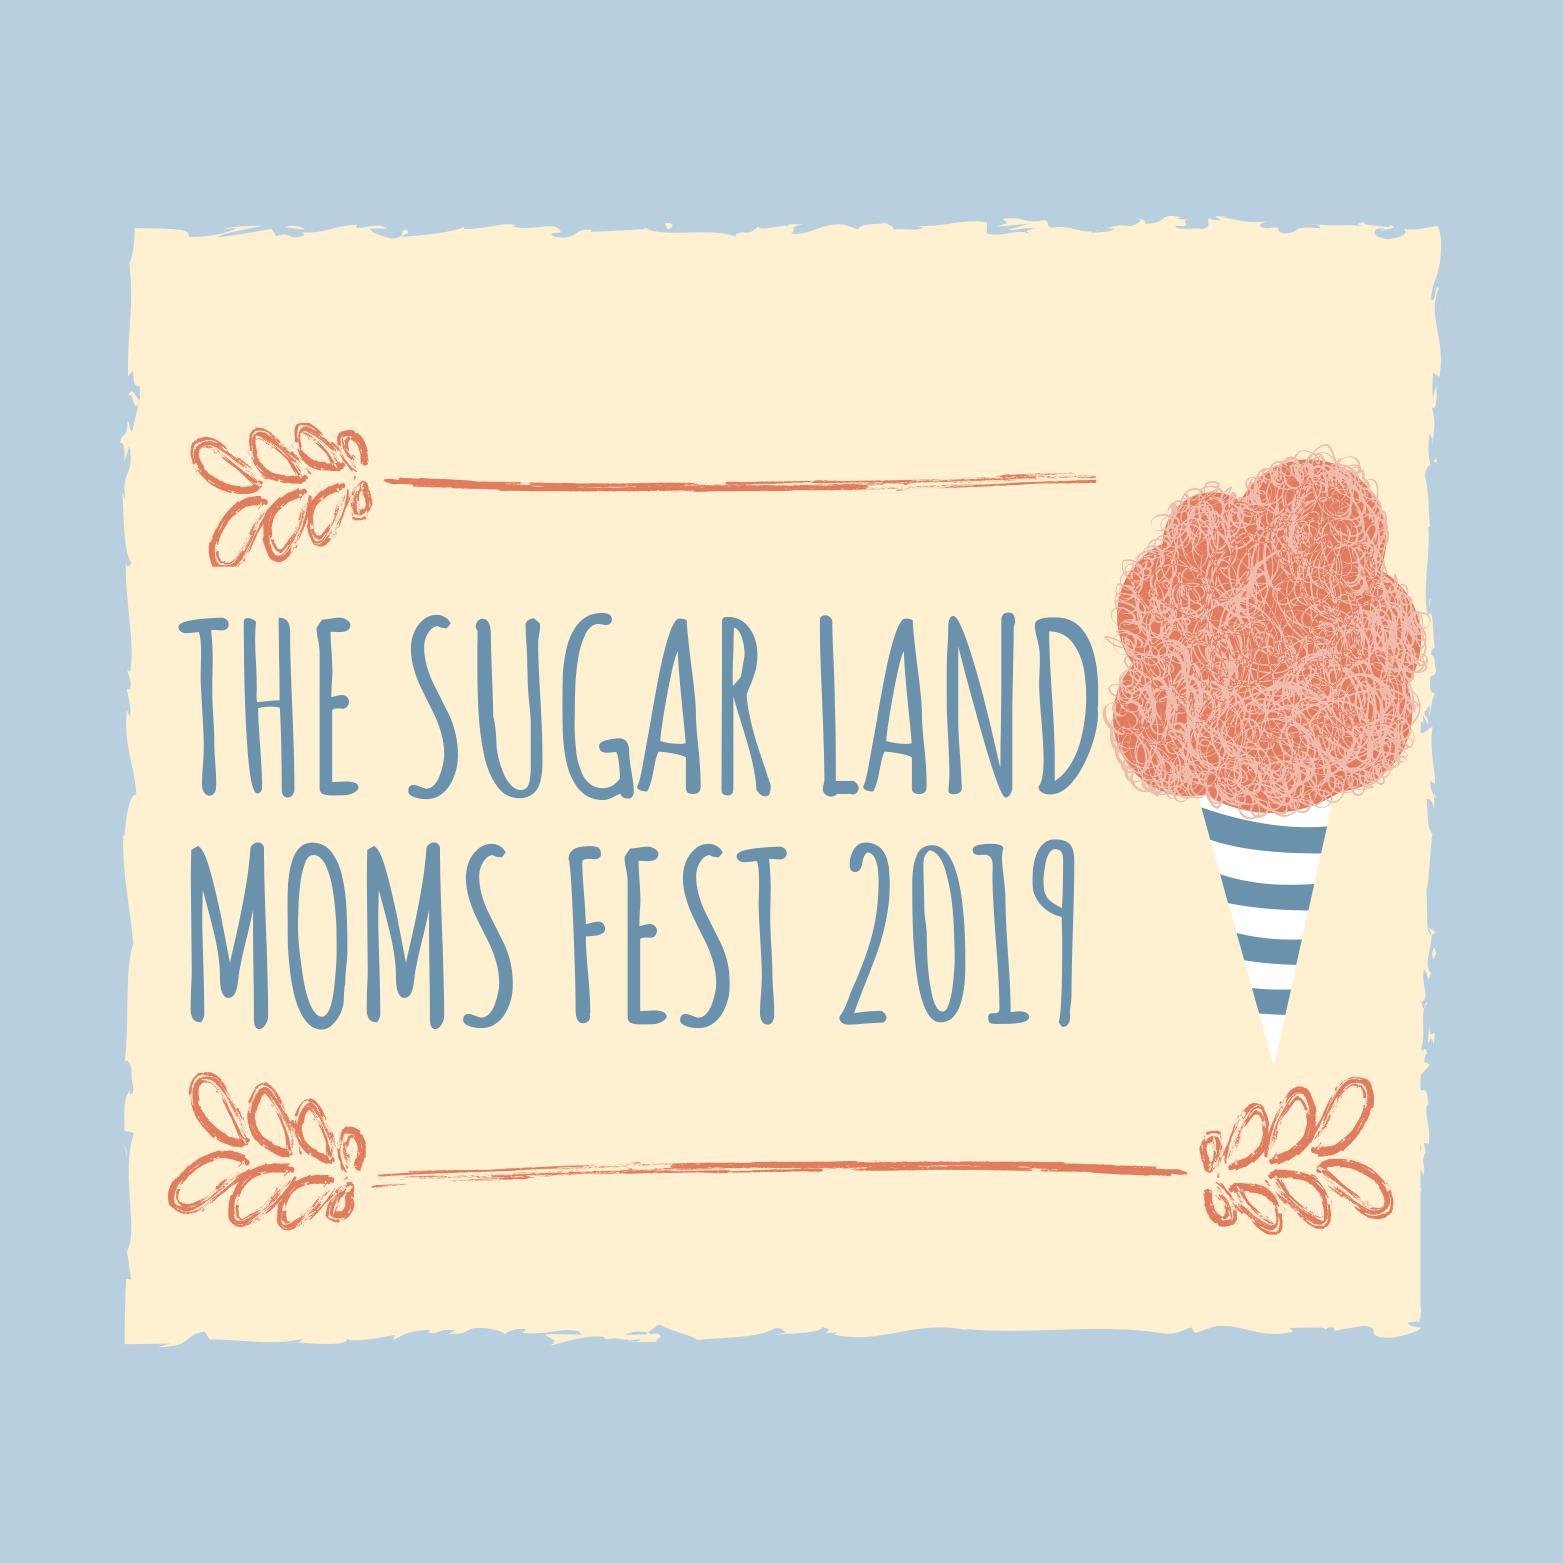 Sugar land moms fest succulent bar vendor 2019 may.jpg